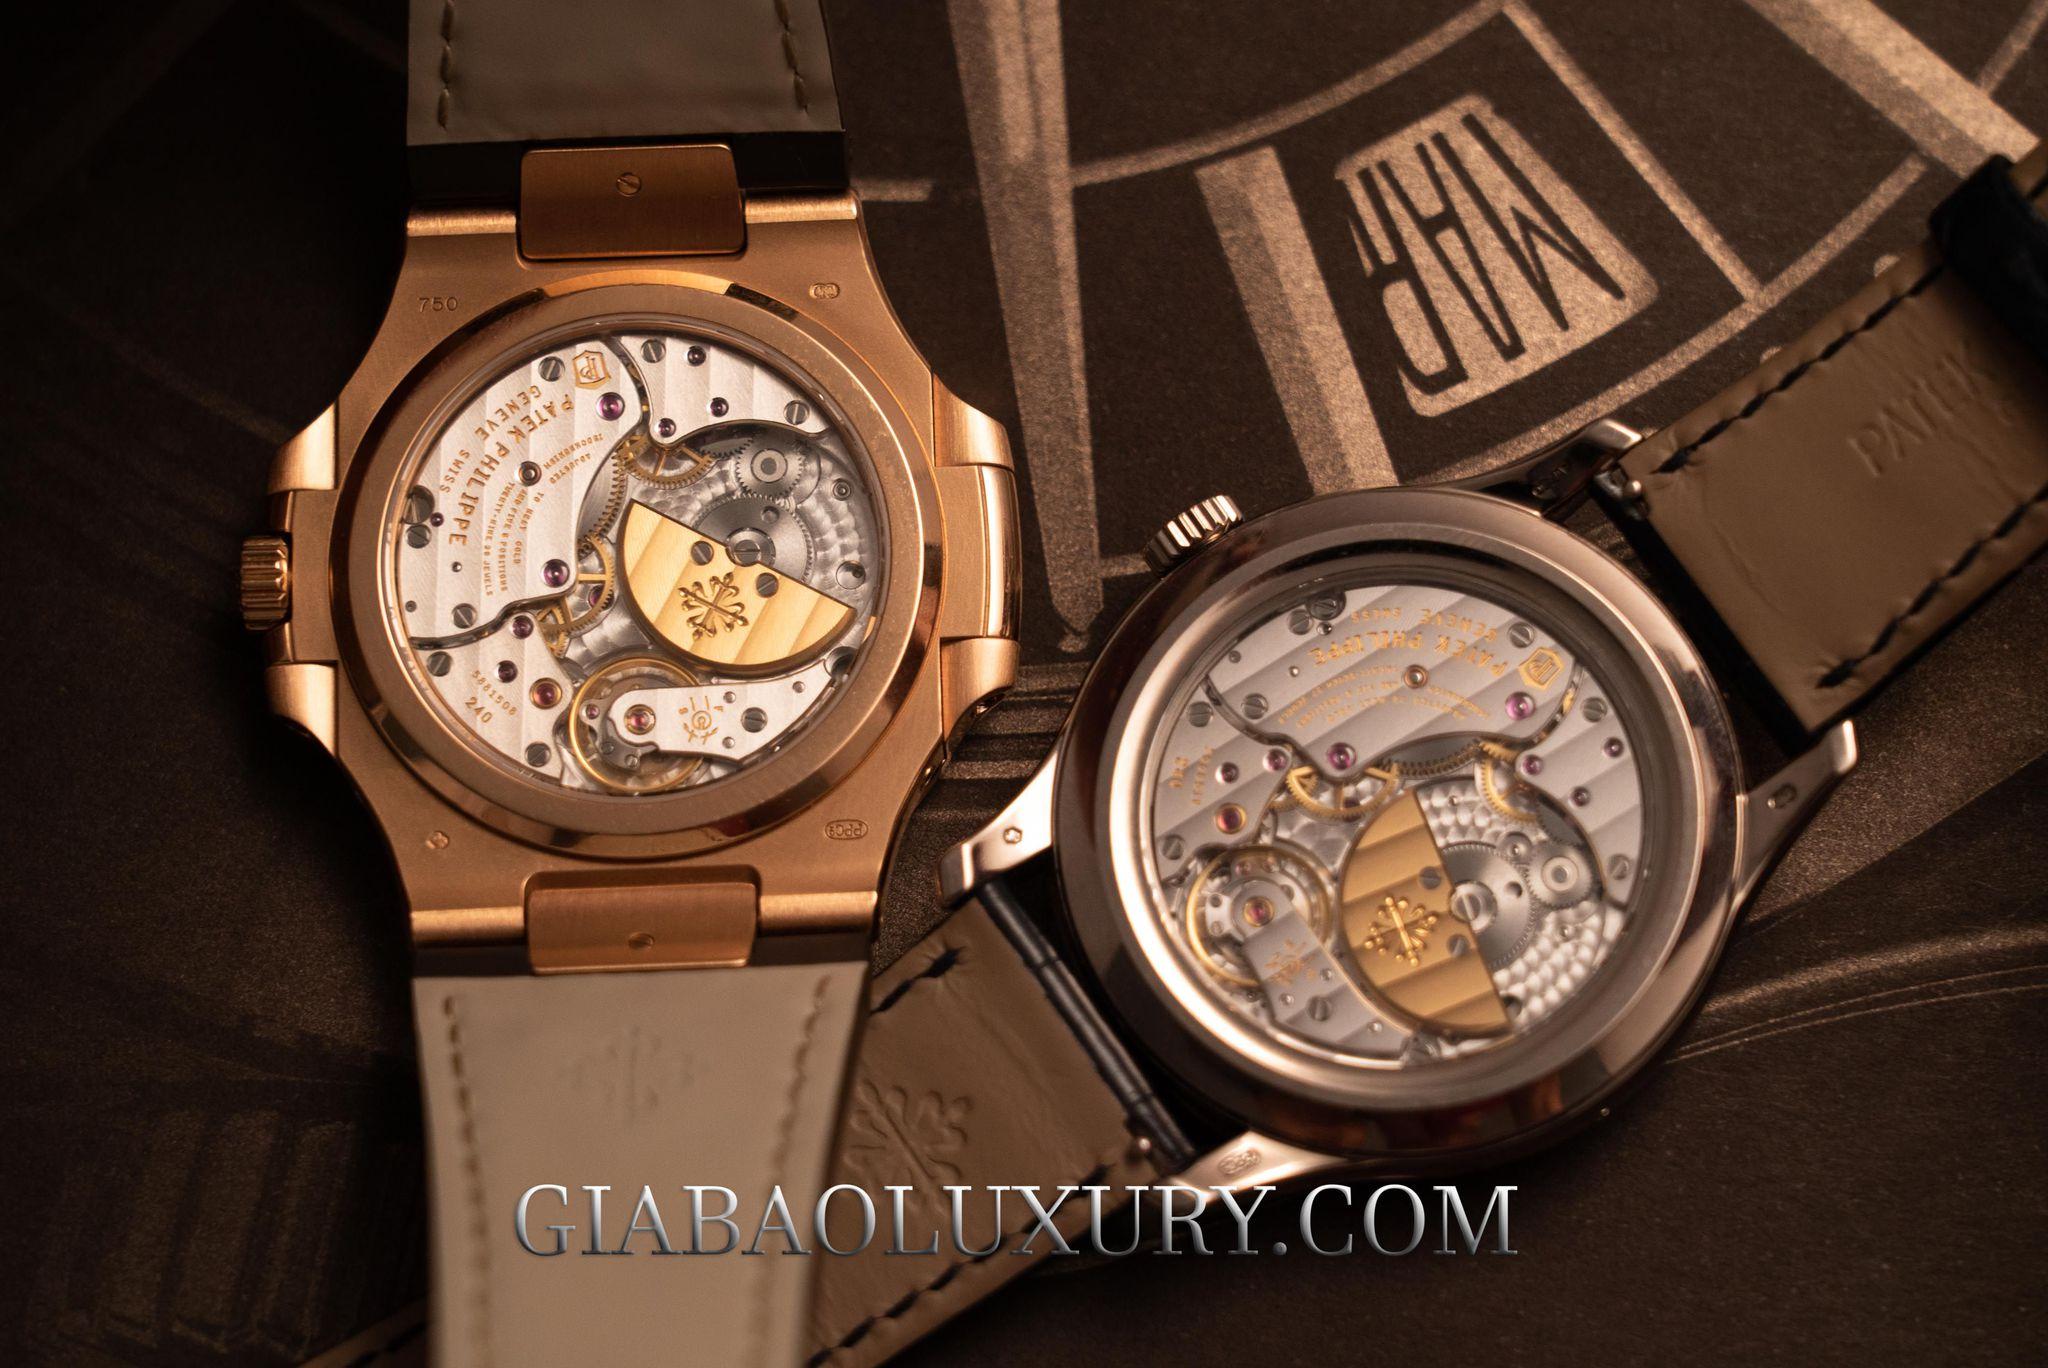 Mặt đấy đồng hồ Patek Philippe